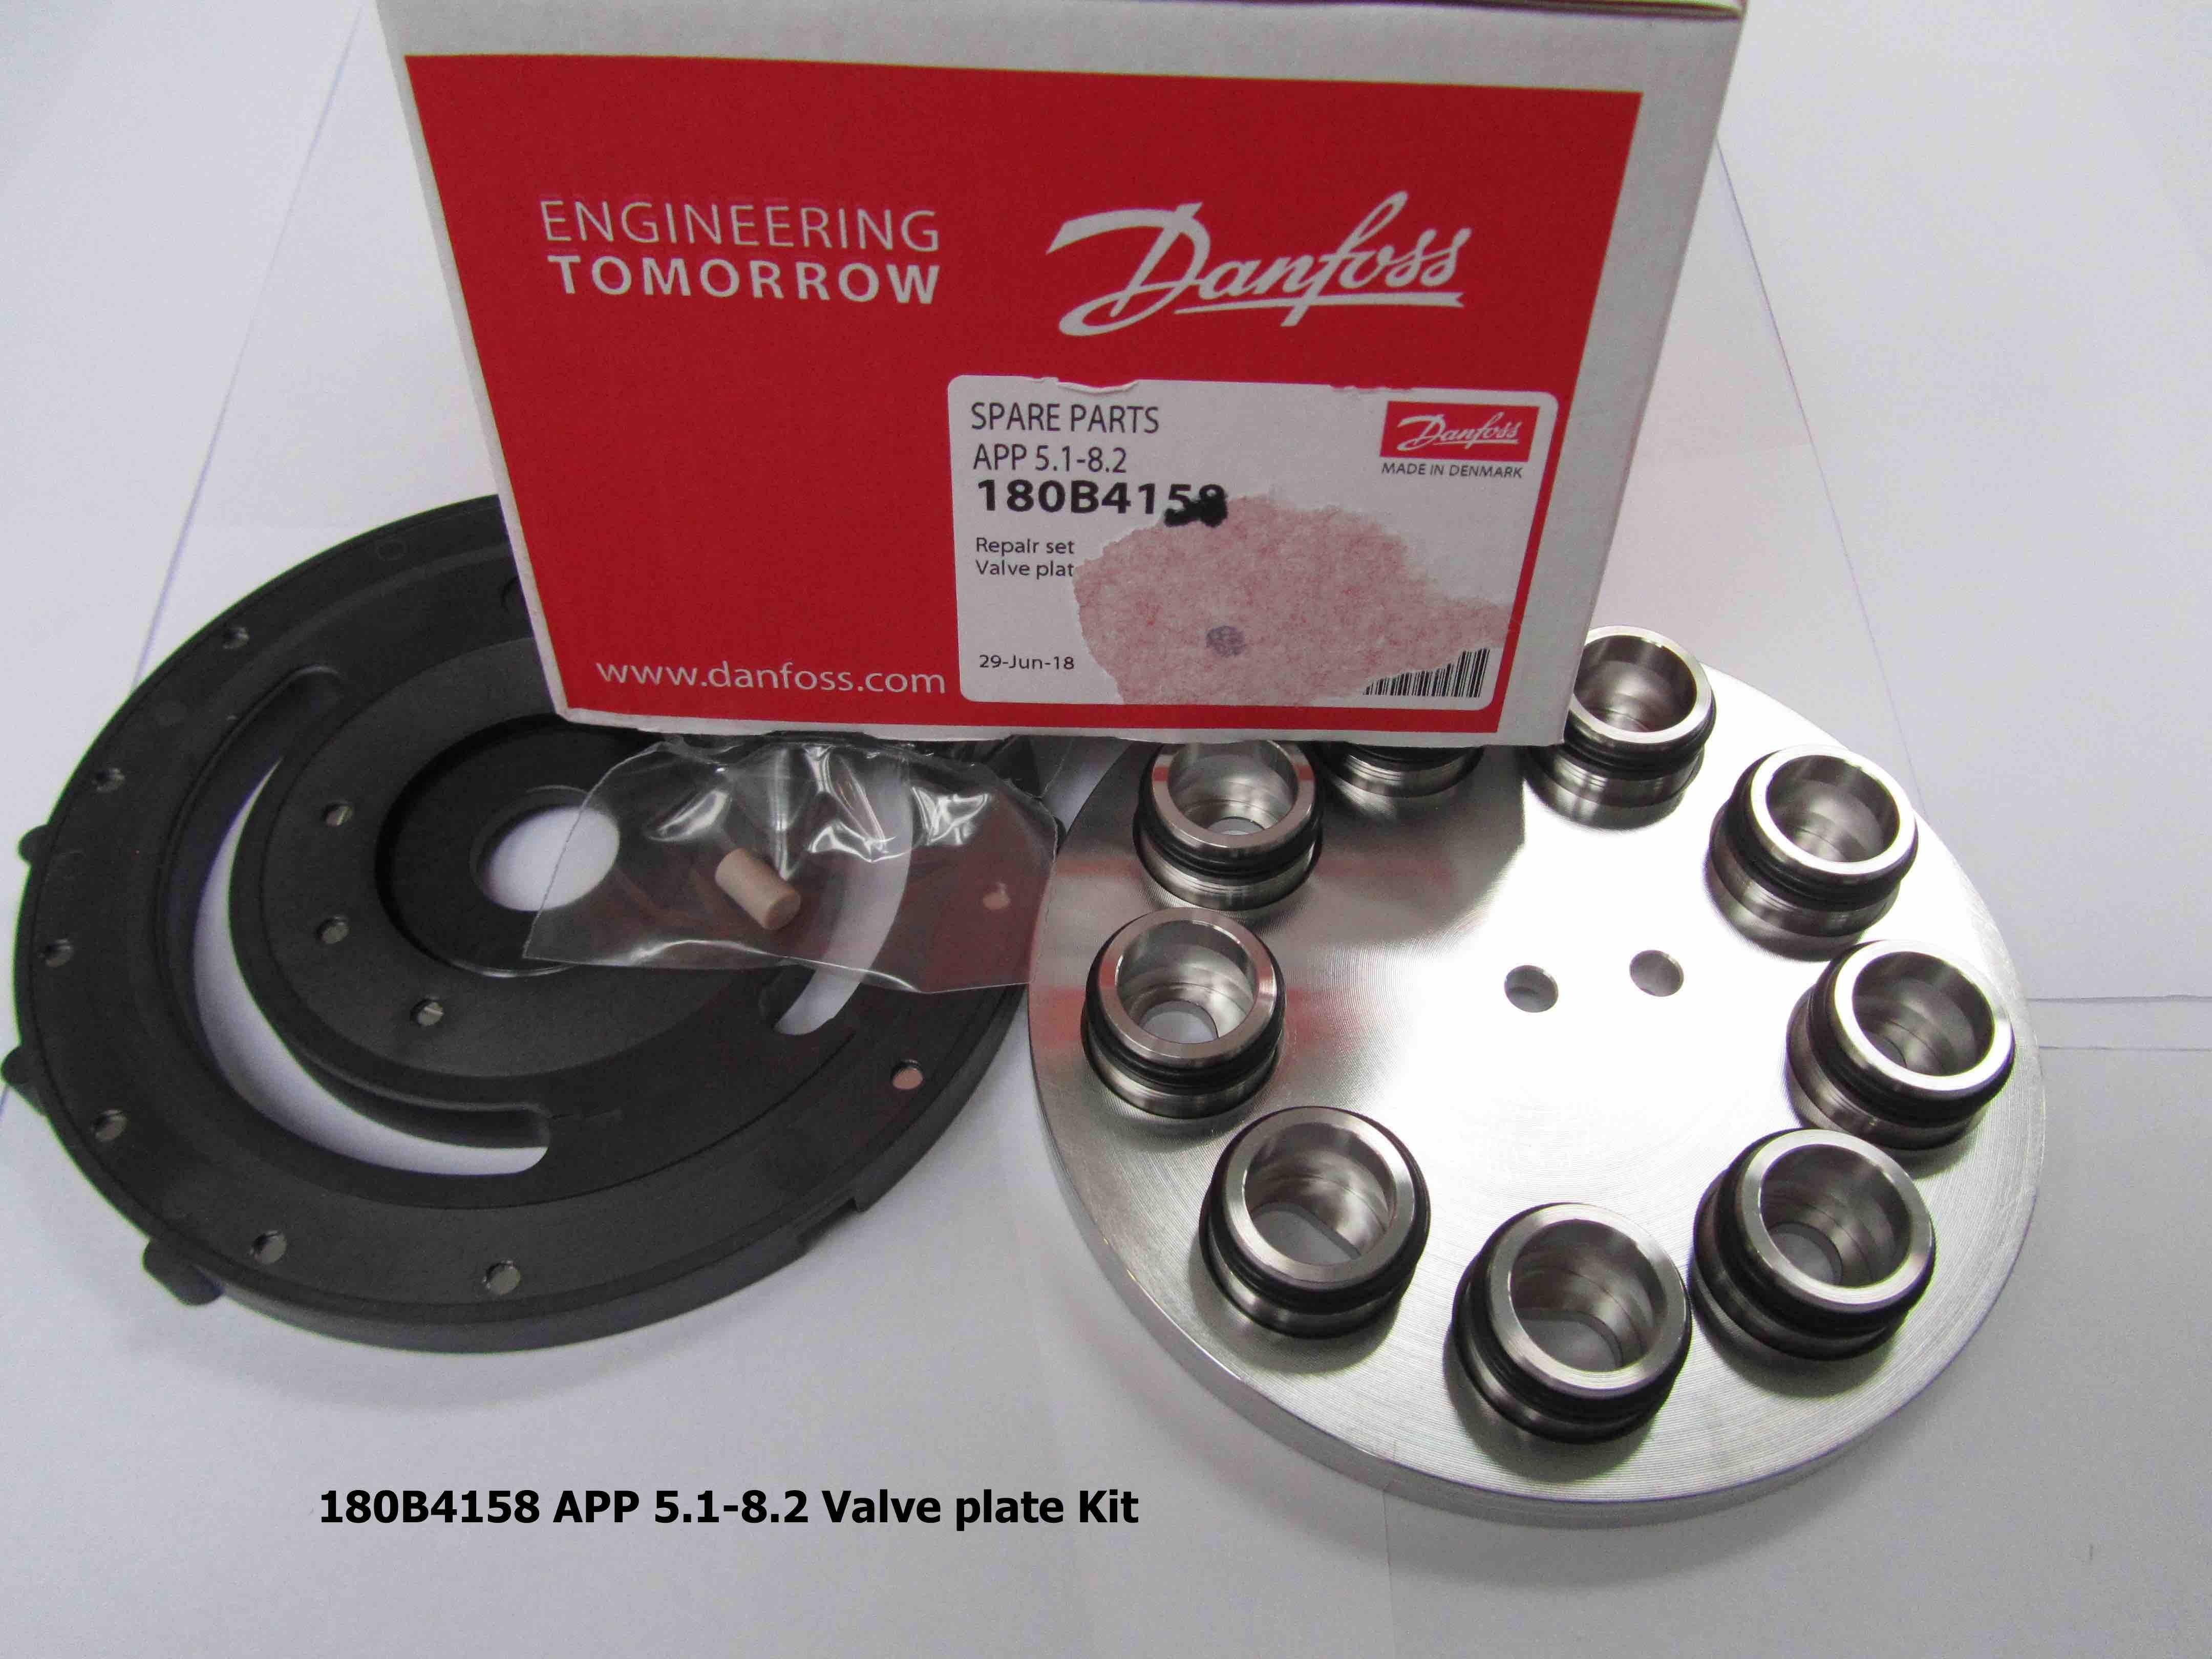 180B4158 APP 5.1-8.2 Valve plate Kit